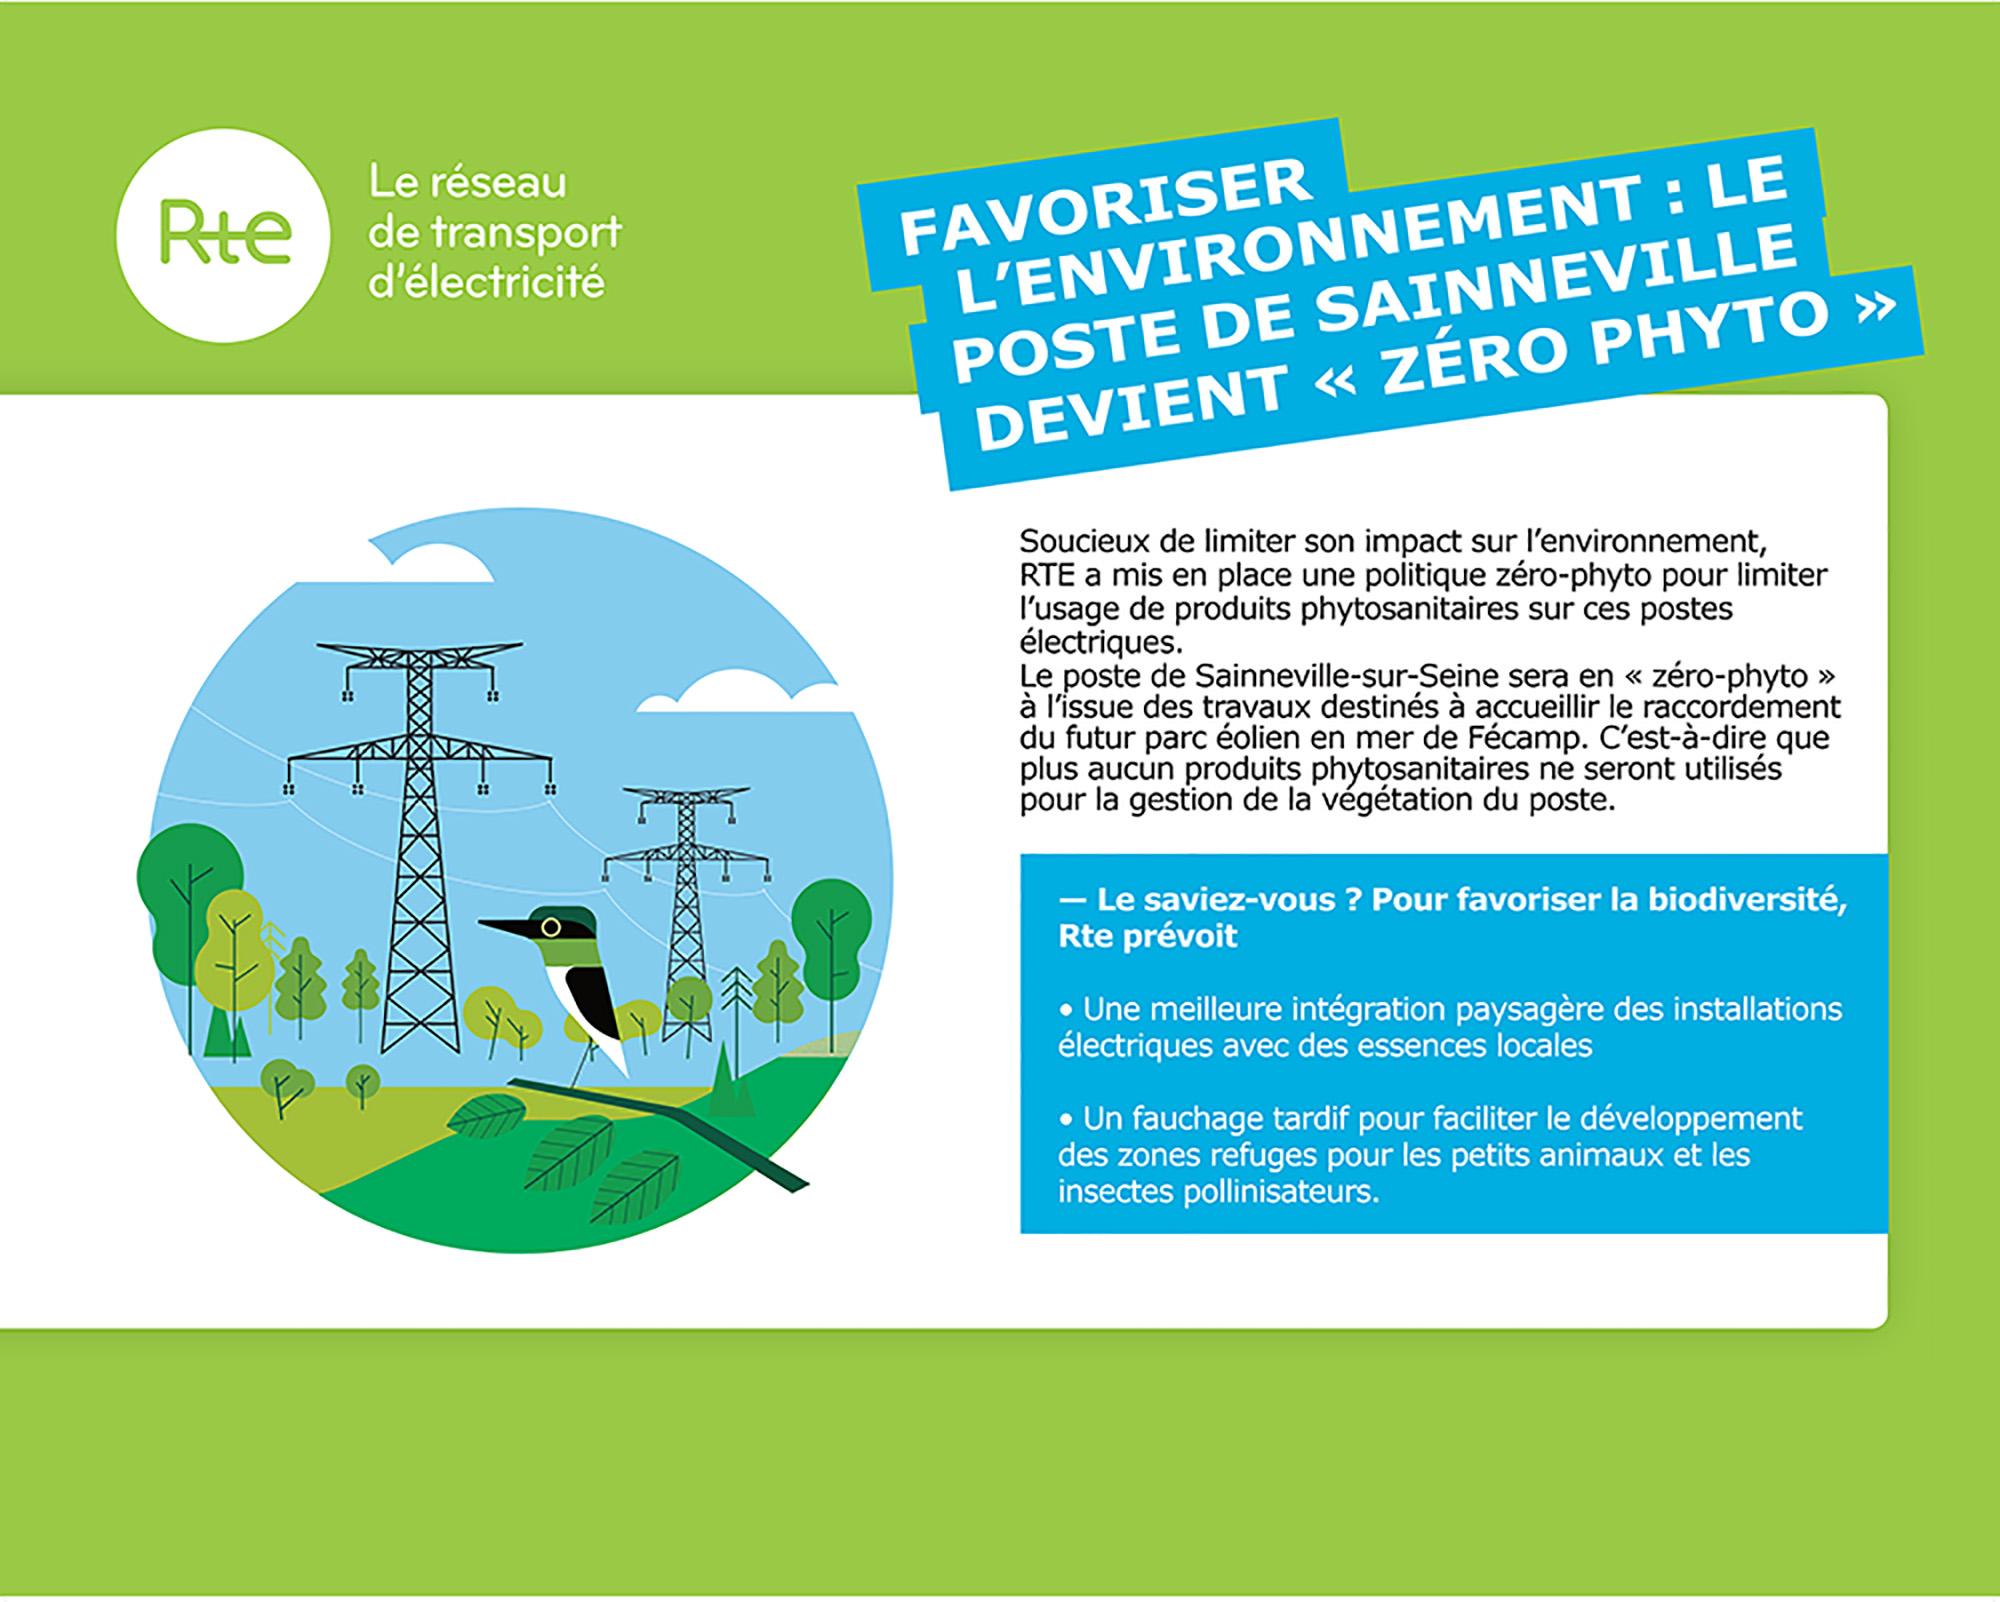 Sainneville-sur-Seine sera désormais «  zéro phyto »